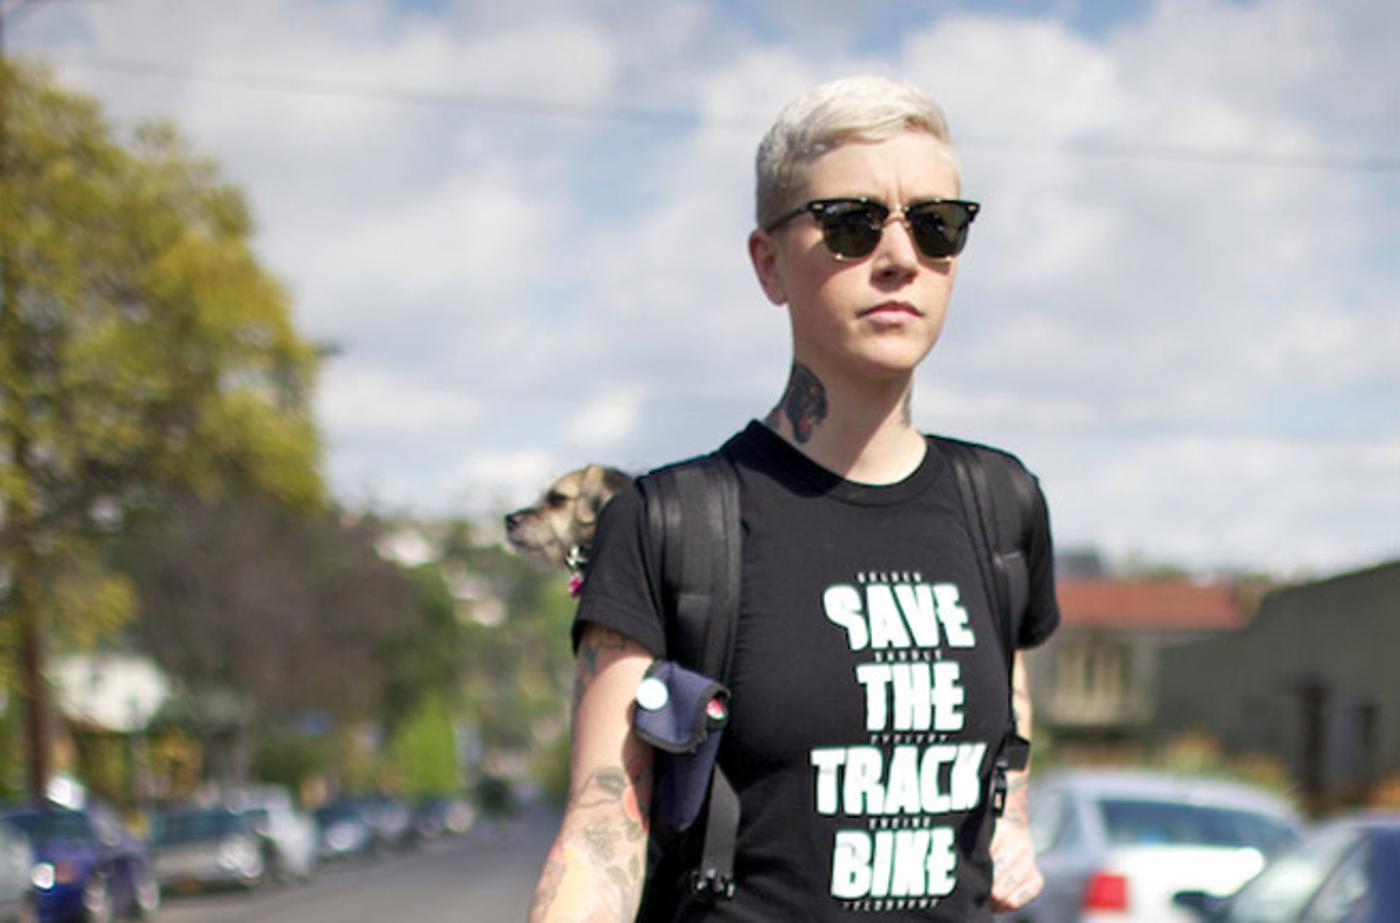 Kelli Returns to Save the Track Bike